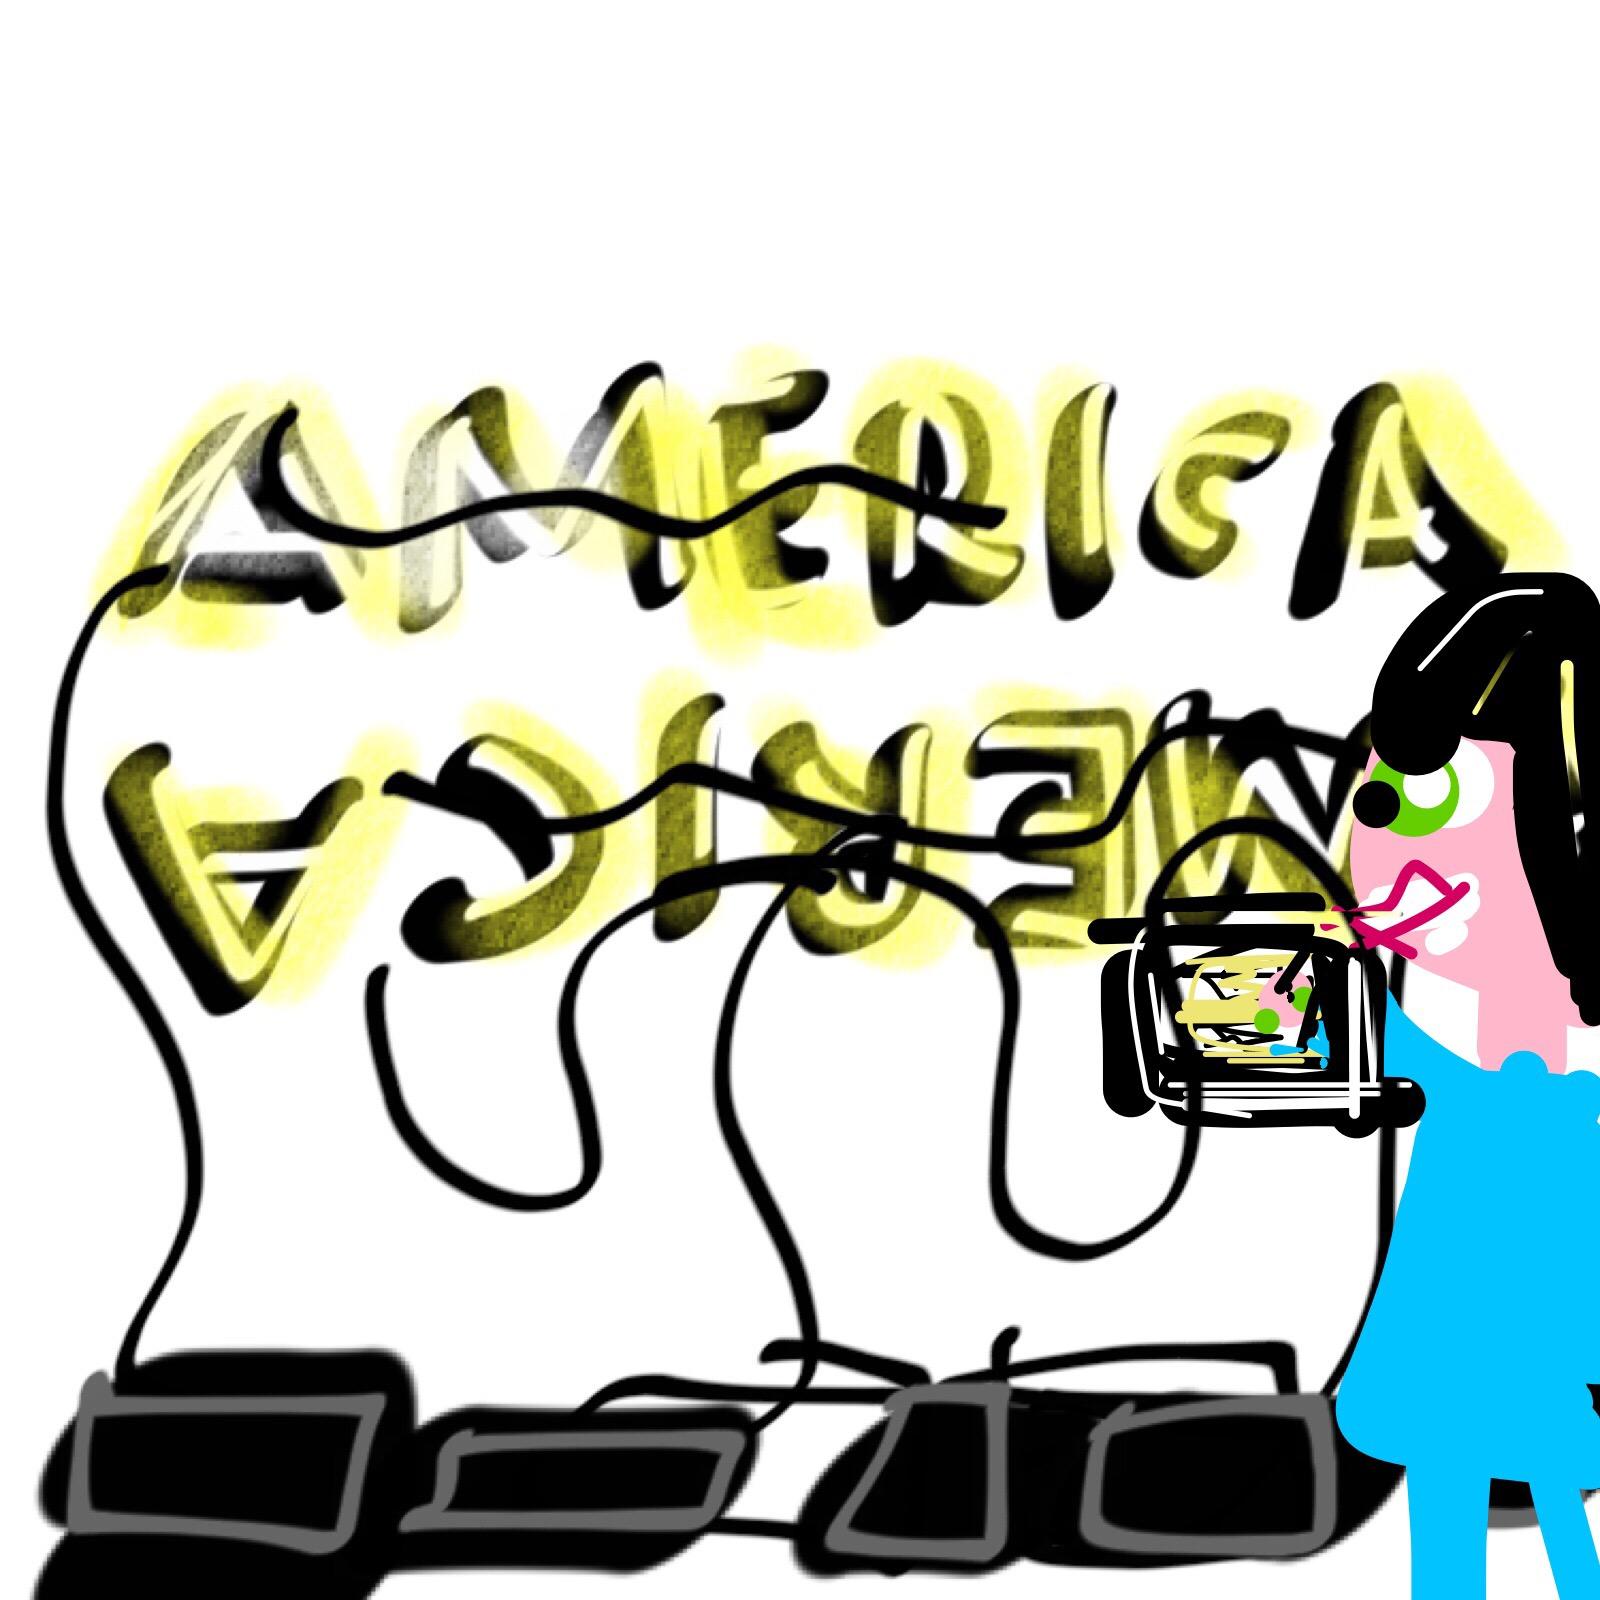 Museum Selfie with Double America, Glenn Ligon, 2014